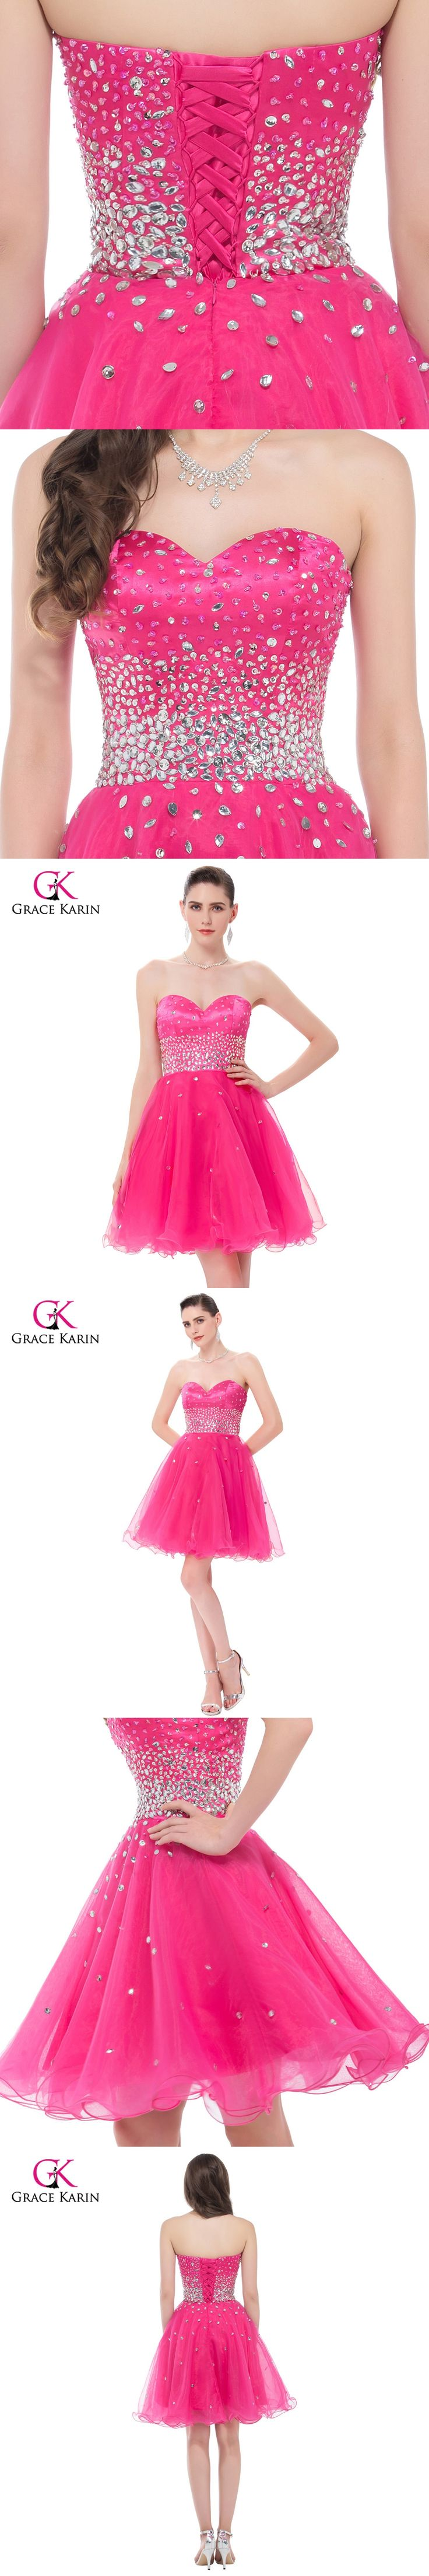 Short Evening Dresses Grace Karin 2017 New Strapless Organza Pink Formal Ball Gowns Dinner Party Dress robe de soiree